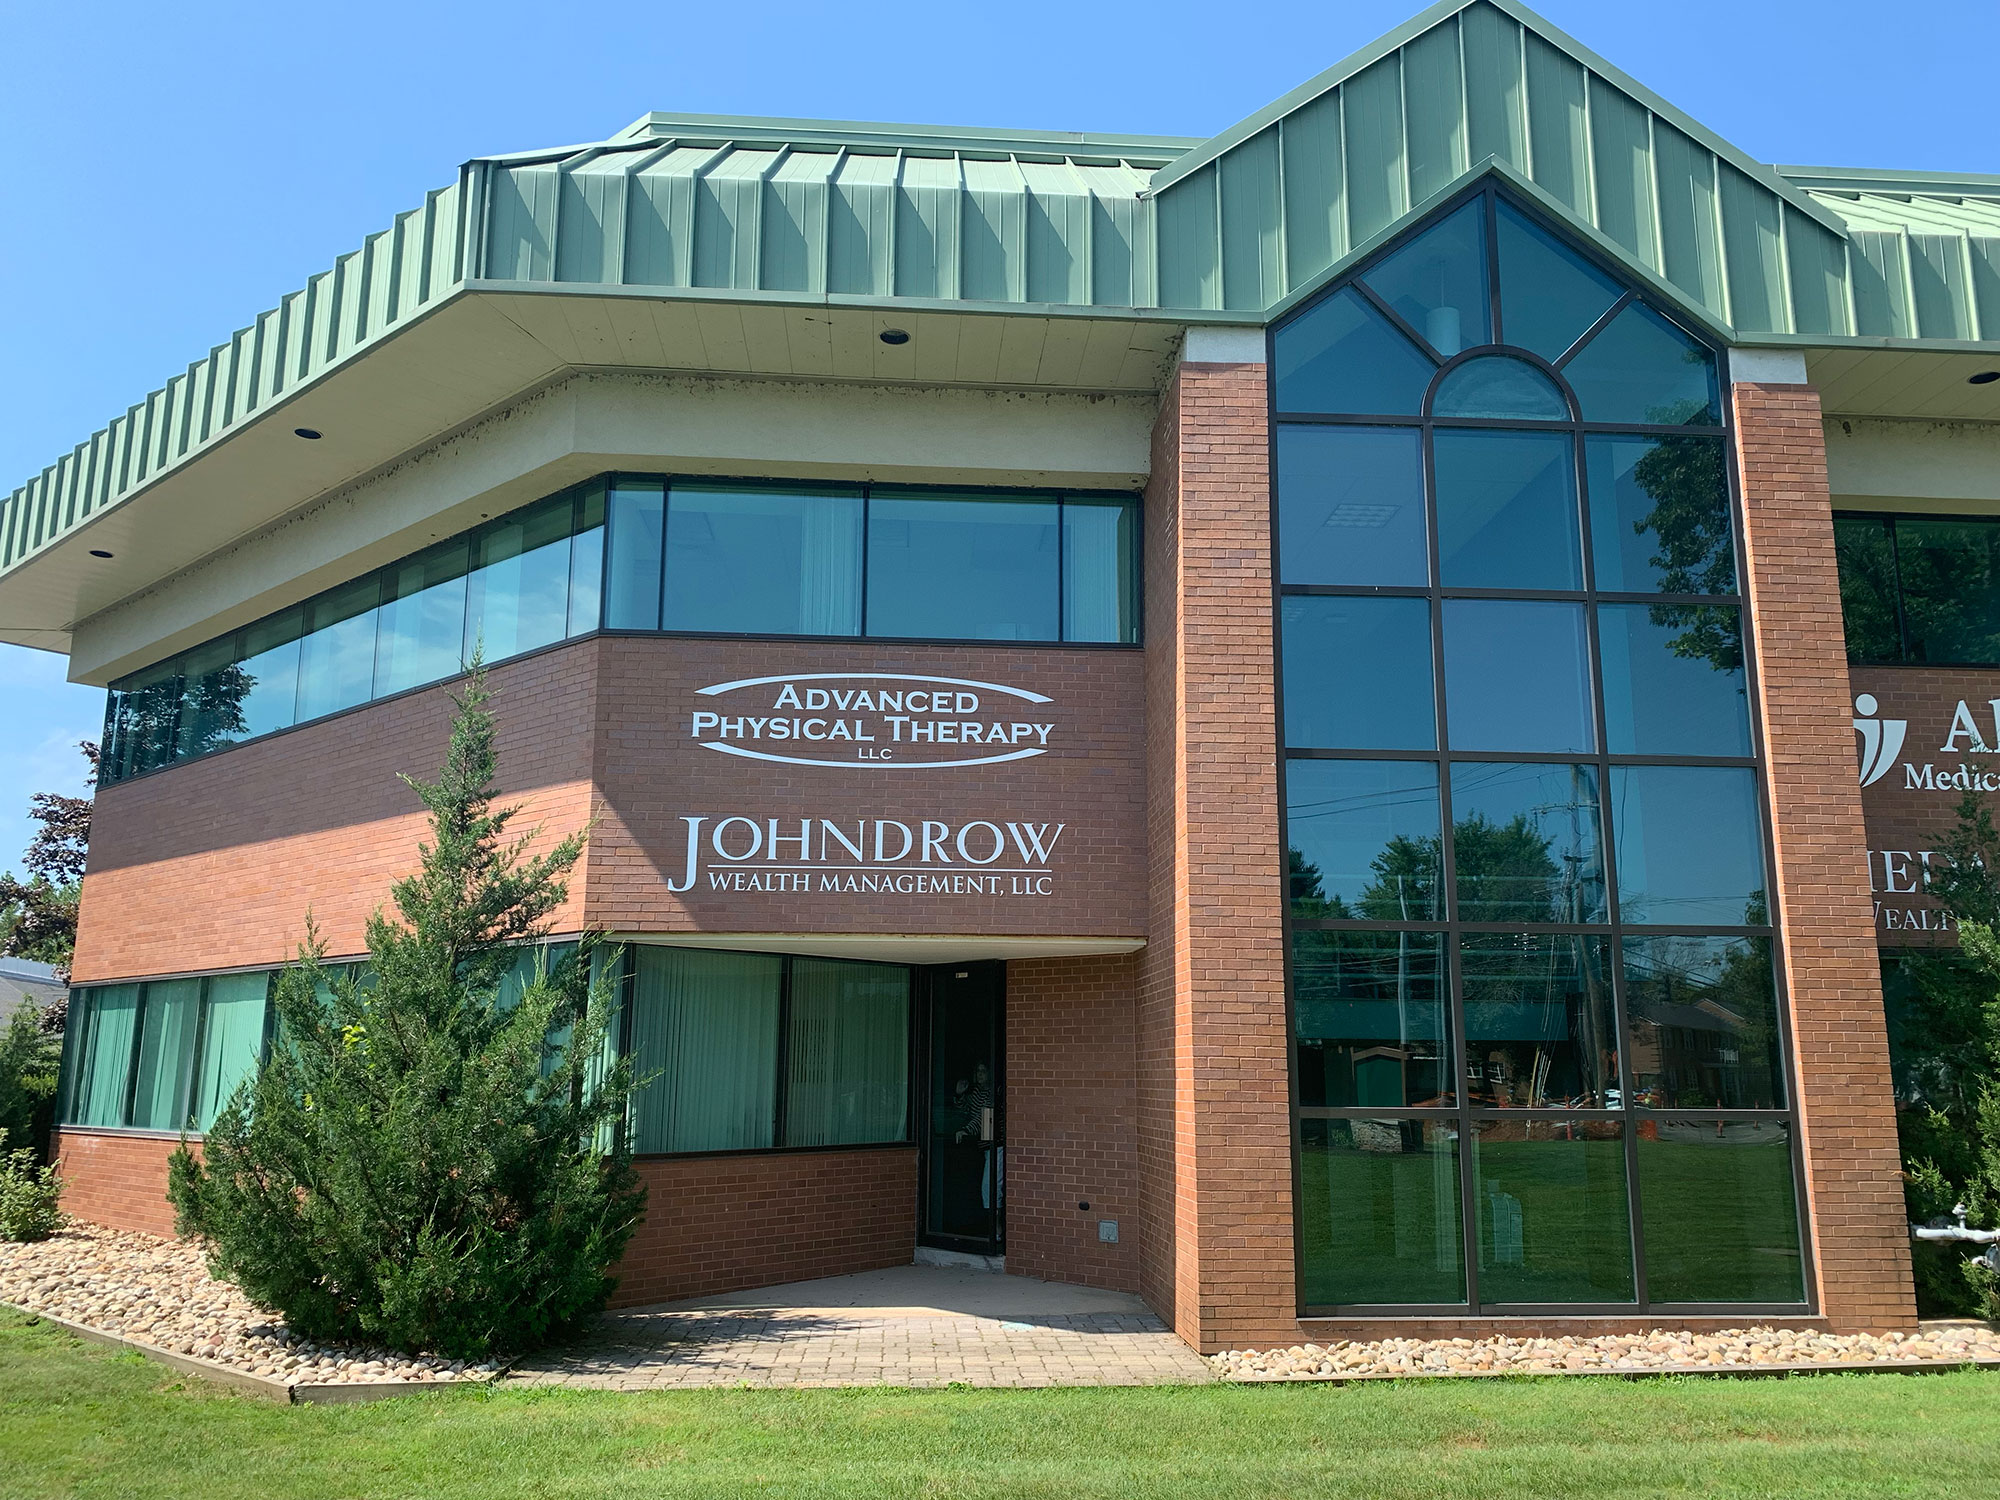 Our Location - 2 Bridgewater Road Farmington, CT 06032